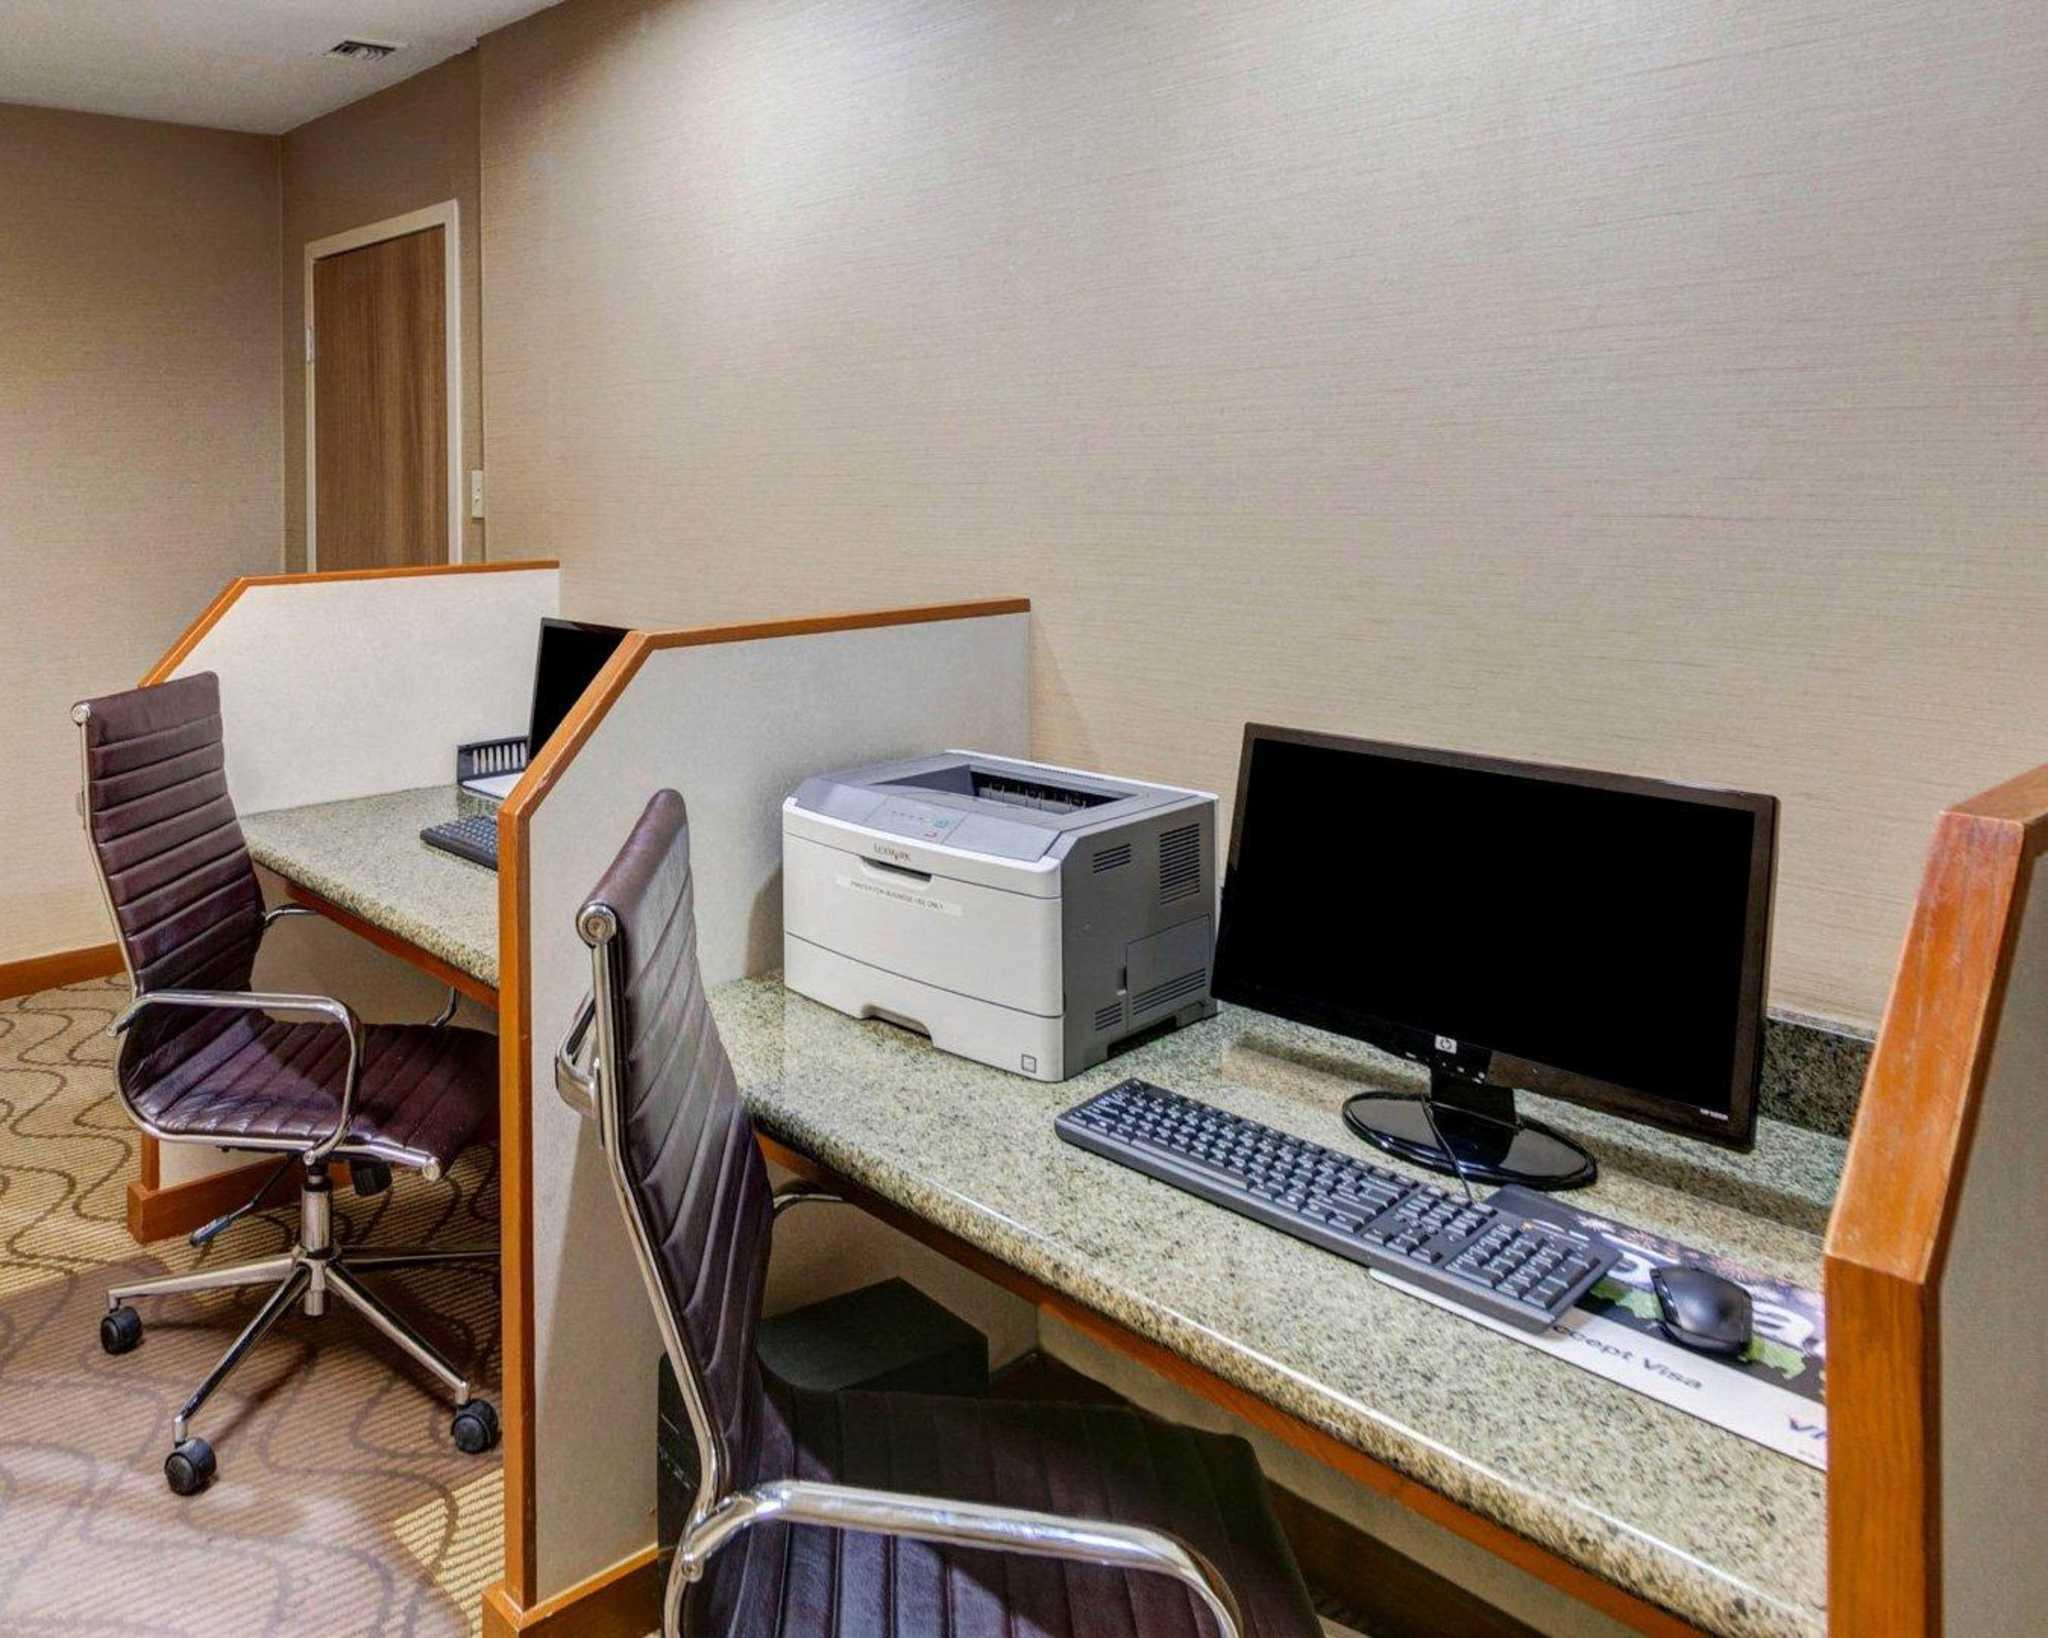 Comfort Inn & Suites Plano East image 58